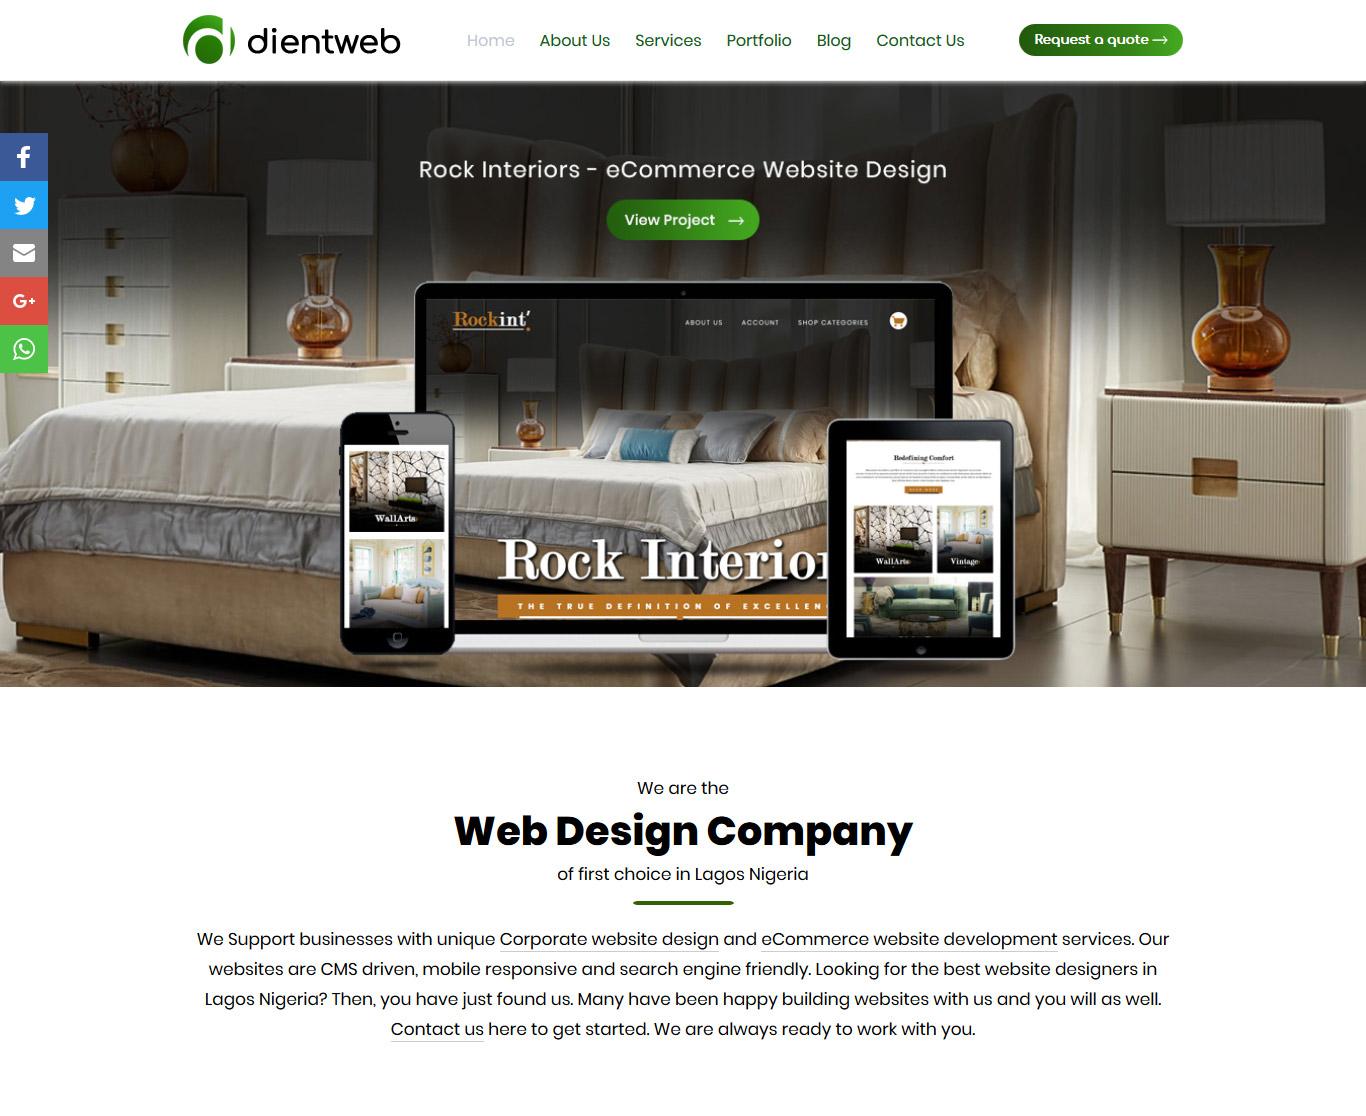 DientWeb web design company in lagos